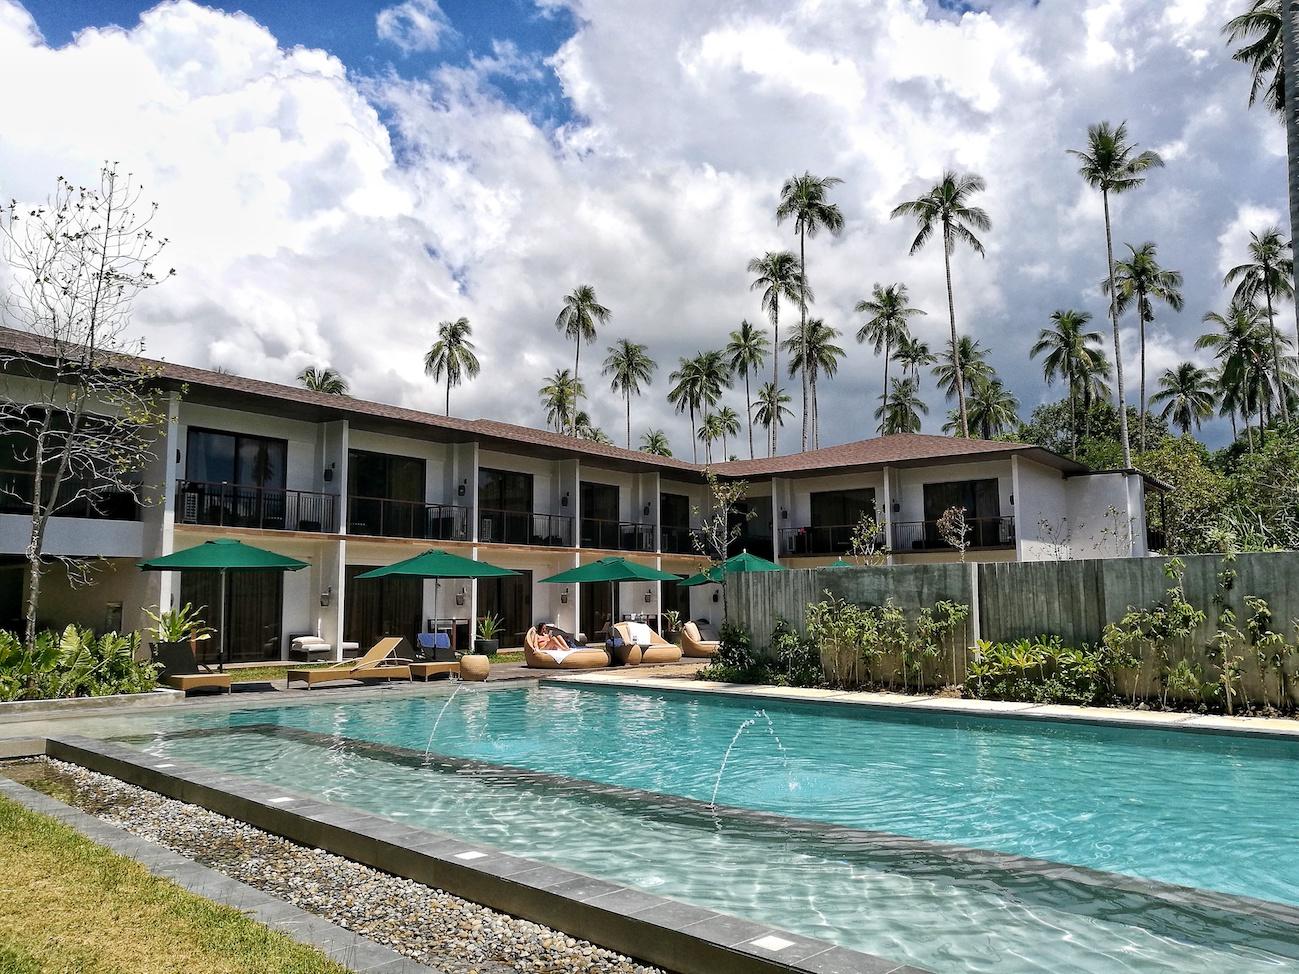 Hotel Review: Casa Kalaw in LiO, El Nido Palawan